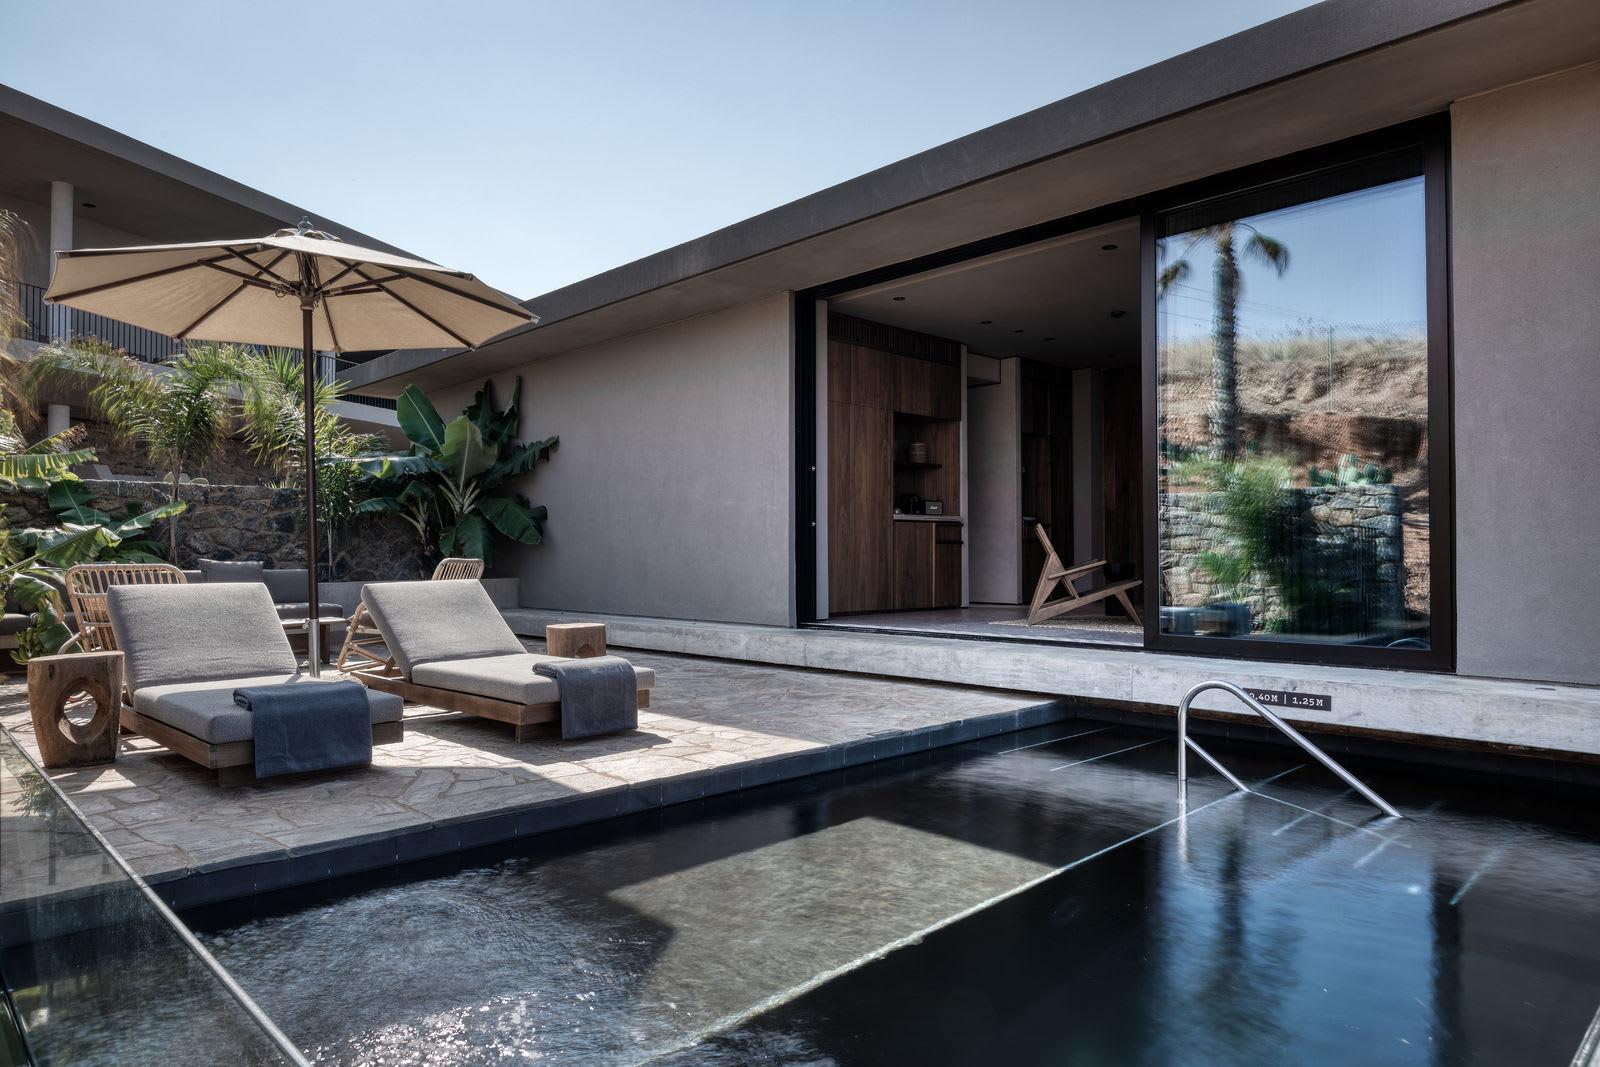 The Villa Outdoor Pool